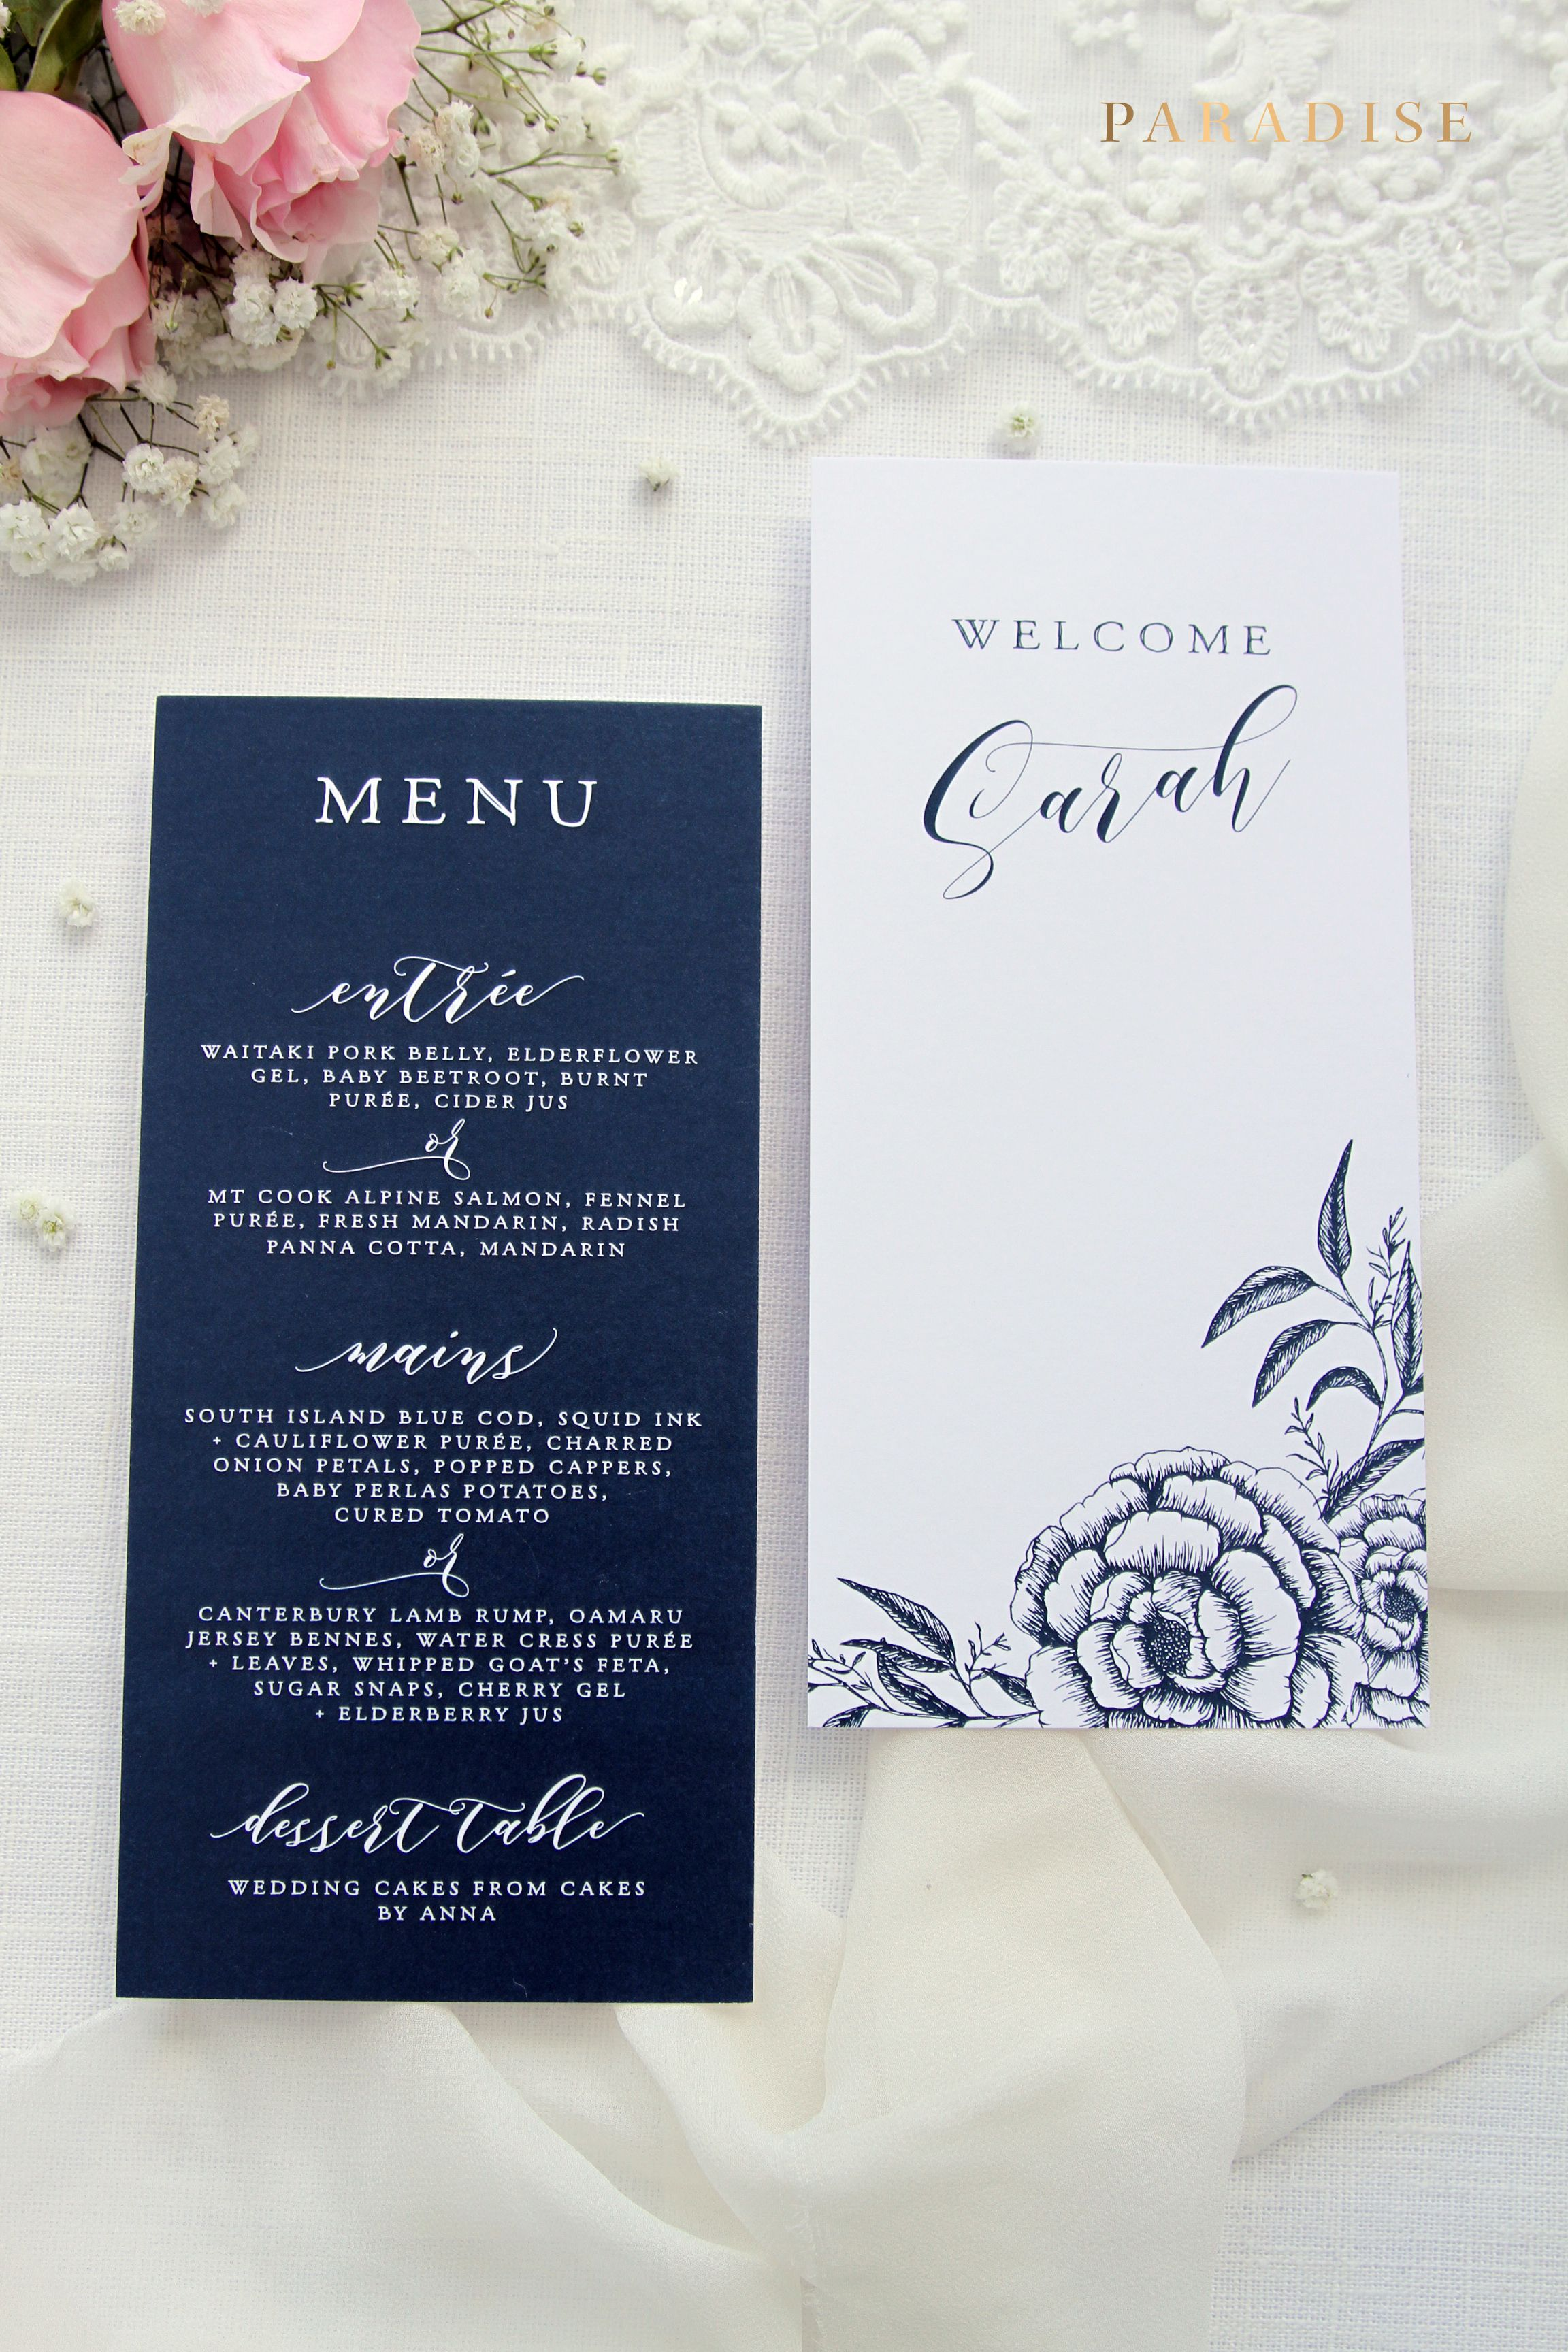 Classy Printable Or Printed Custom Made Printed Wedding Menu Cards Printable Or Printed Custom Made Printed Wedding Menu Wedding Menu Template Free Printable Wedding Menu Template Photoshop wedding Wedding Menu Template